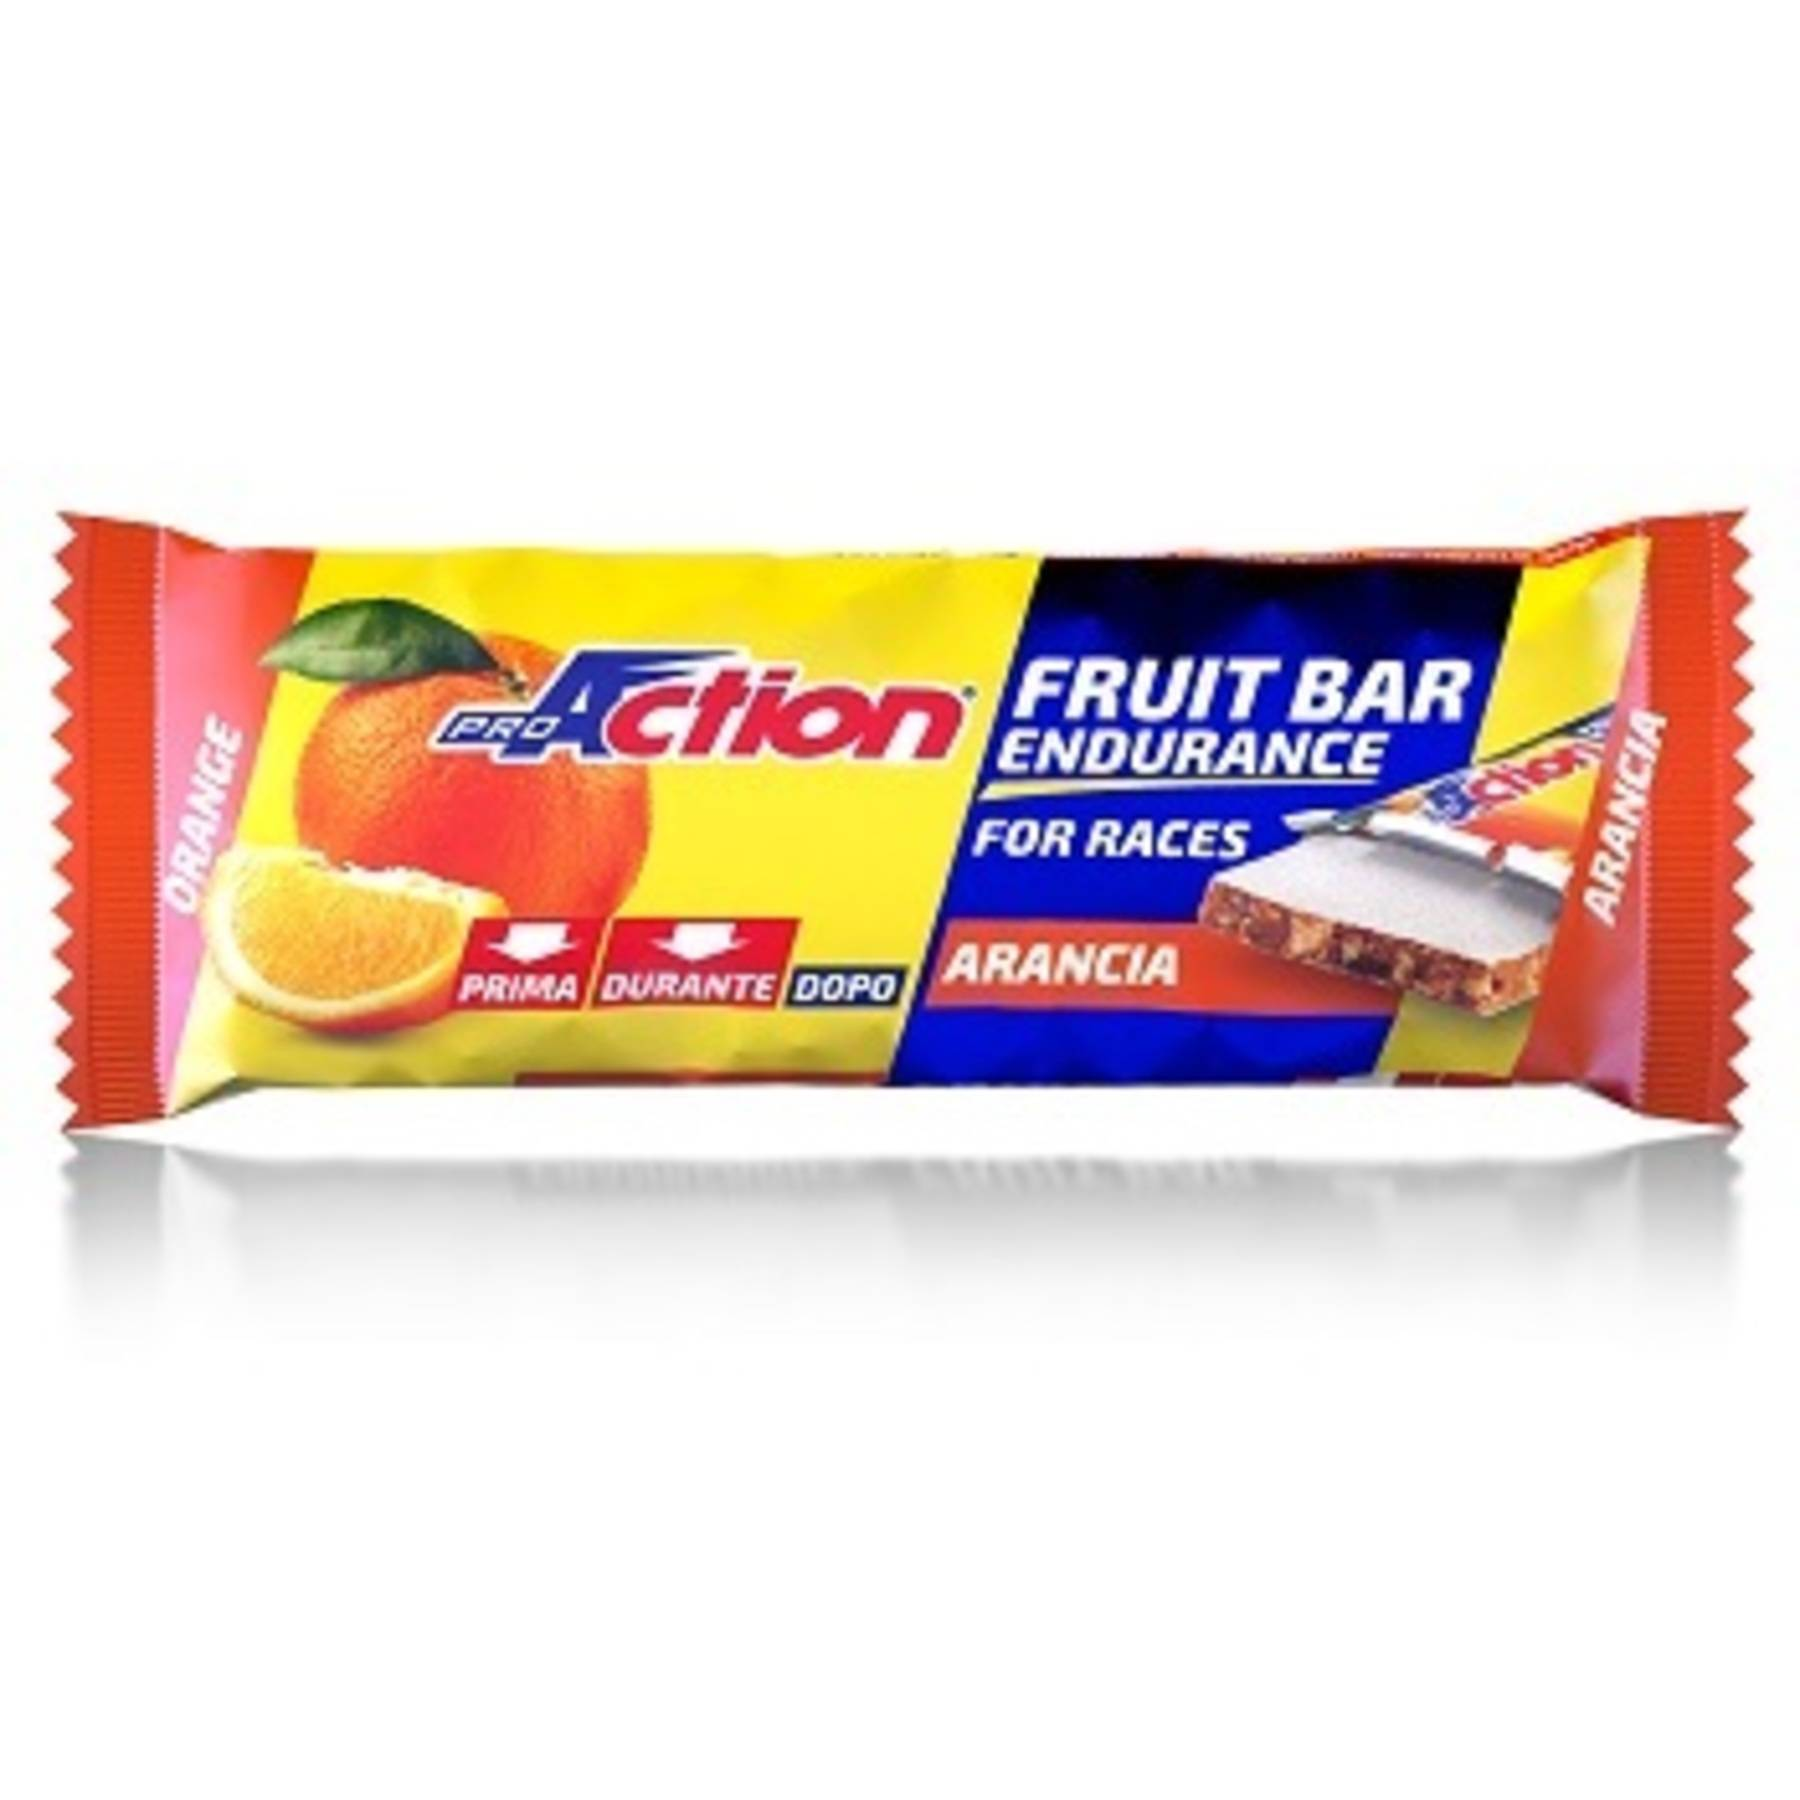 proaction srl proaction fruit bar barretta energetica all'arancia 40 g